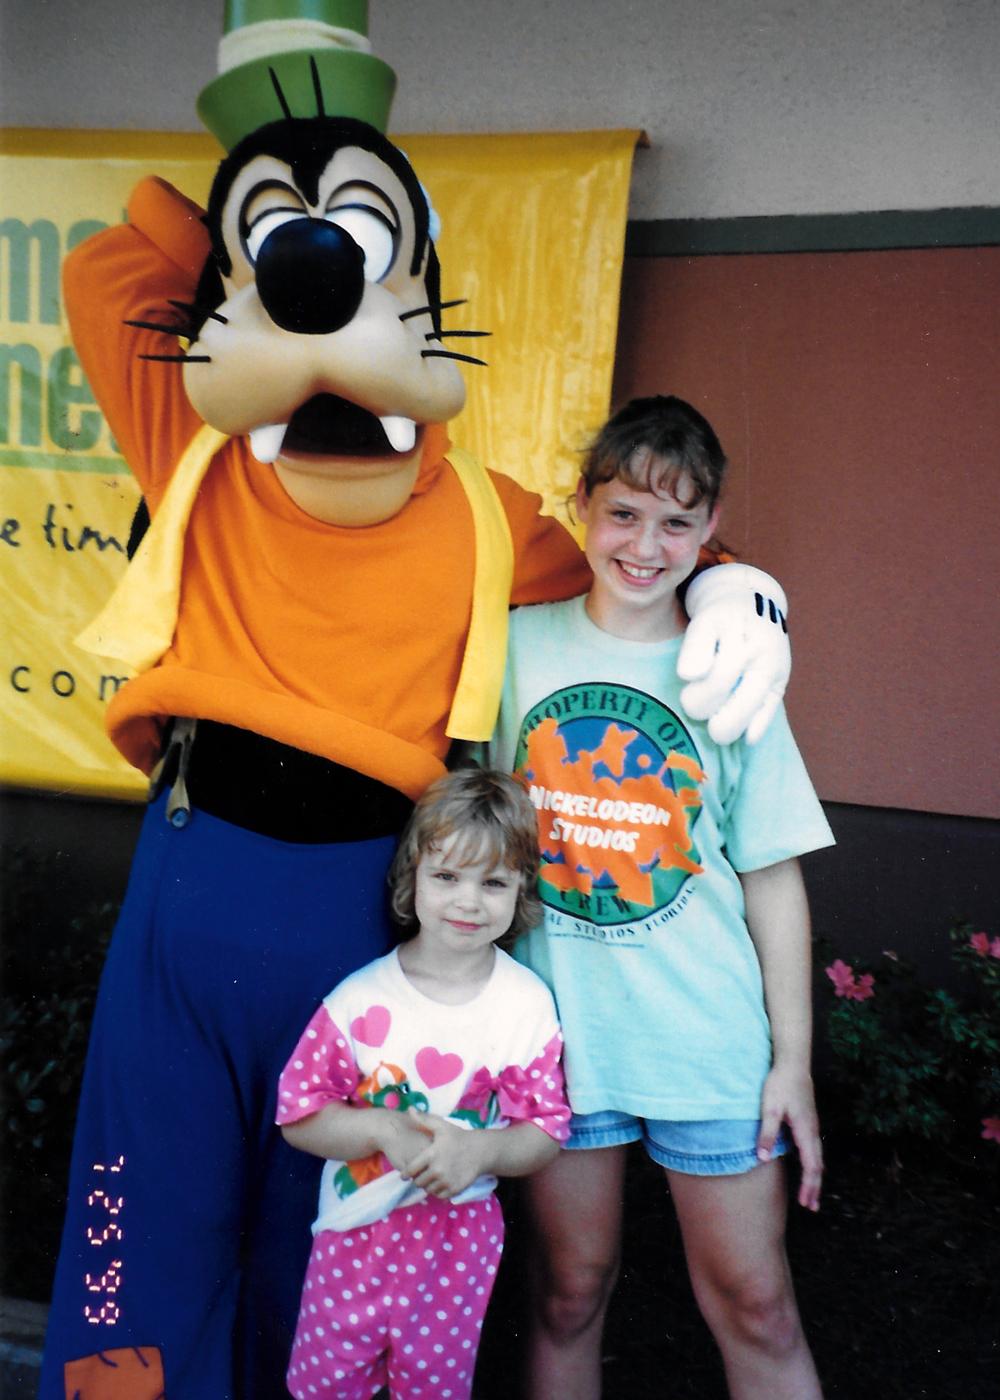 Goofy@Disneyworld